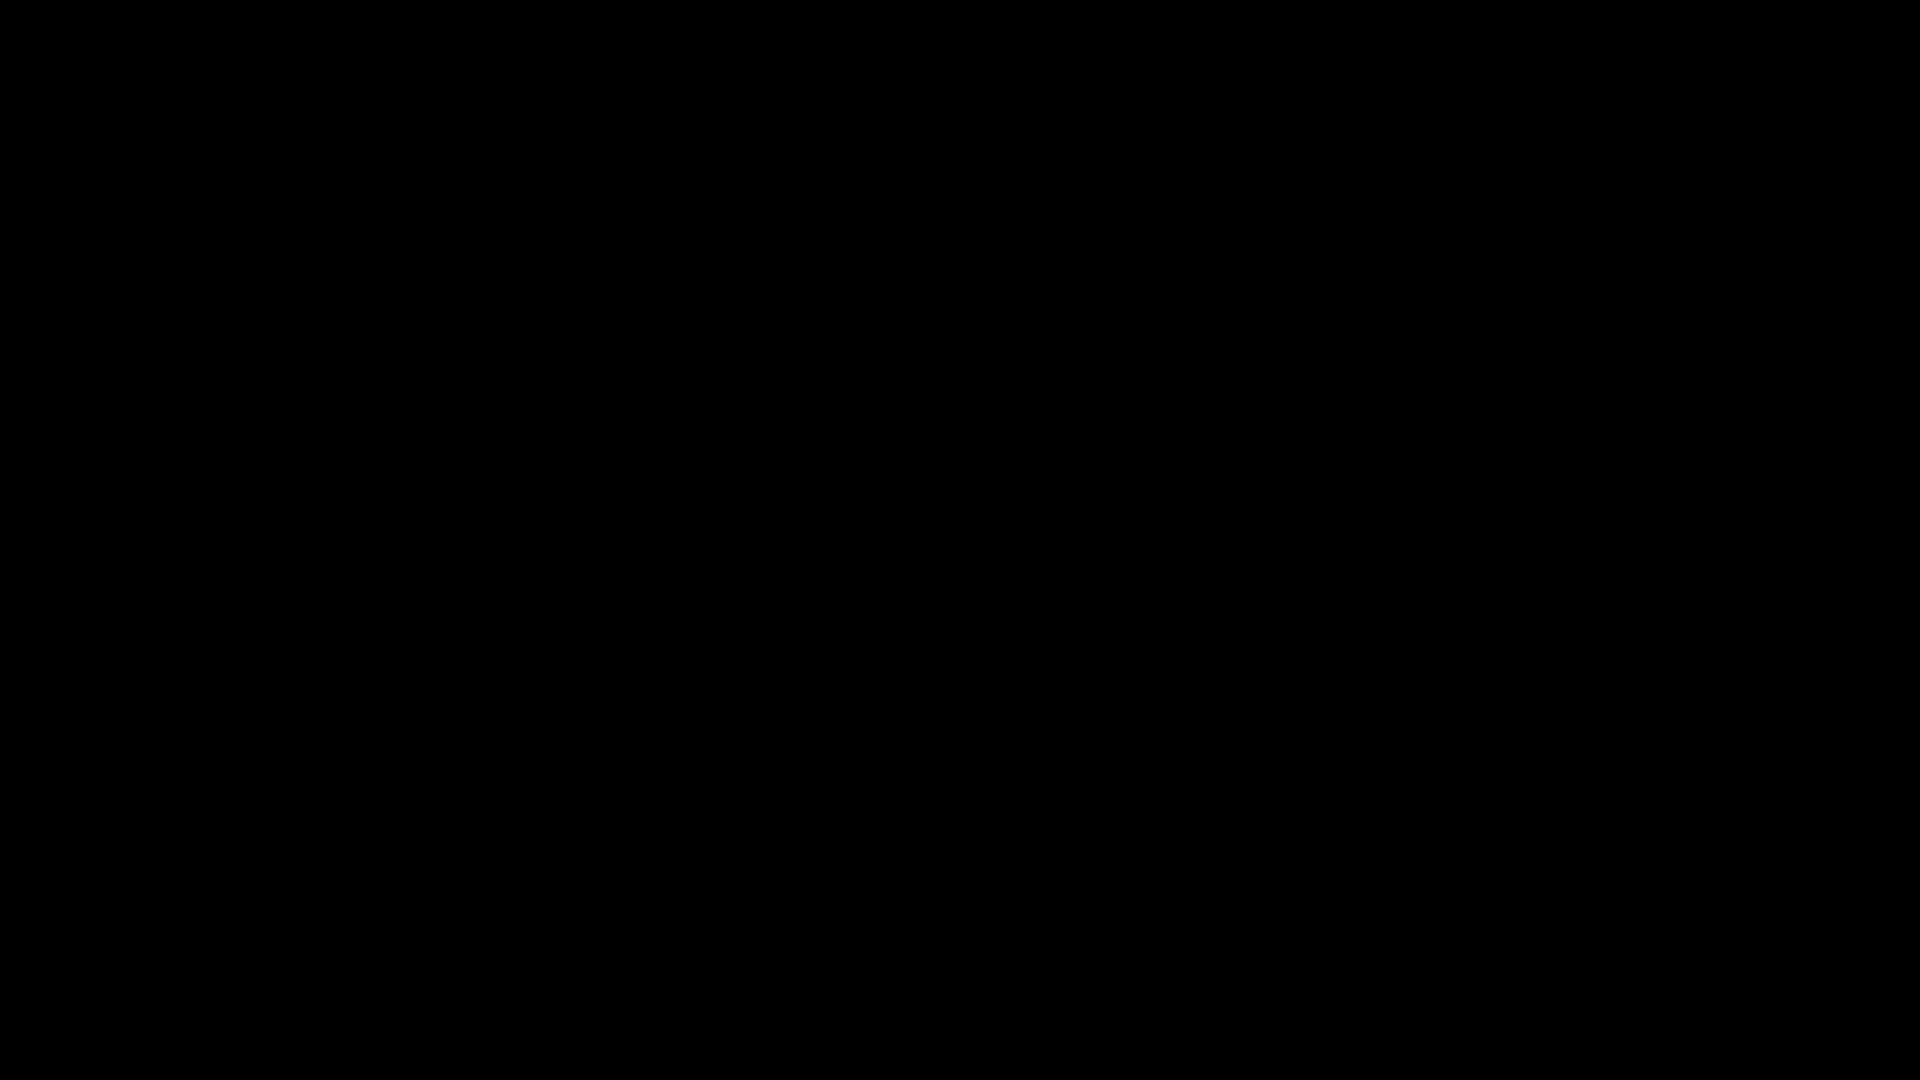 poor customer service in ghana, customer service delivery in ghana, customer service training in ghana, customer service jobs in ghana, vodafone ghana customer service, mtn ghana customer service, customer service courses in ghana, ghana institute of customer service,